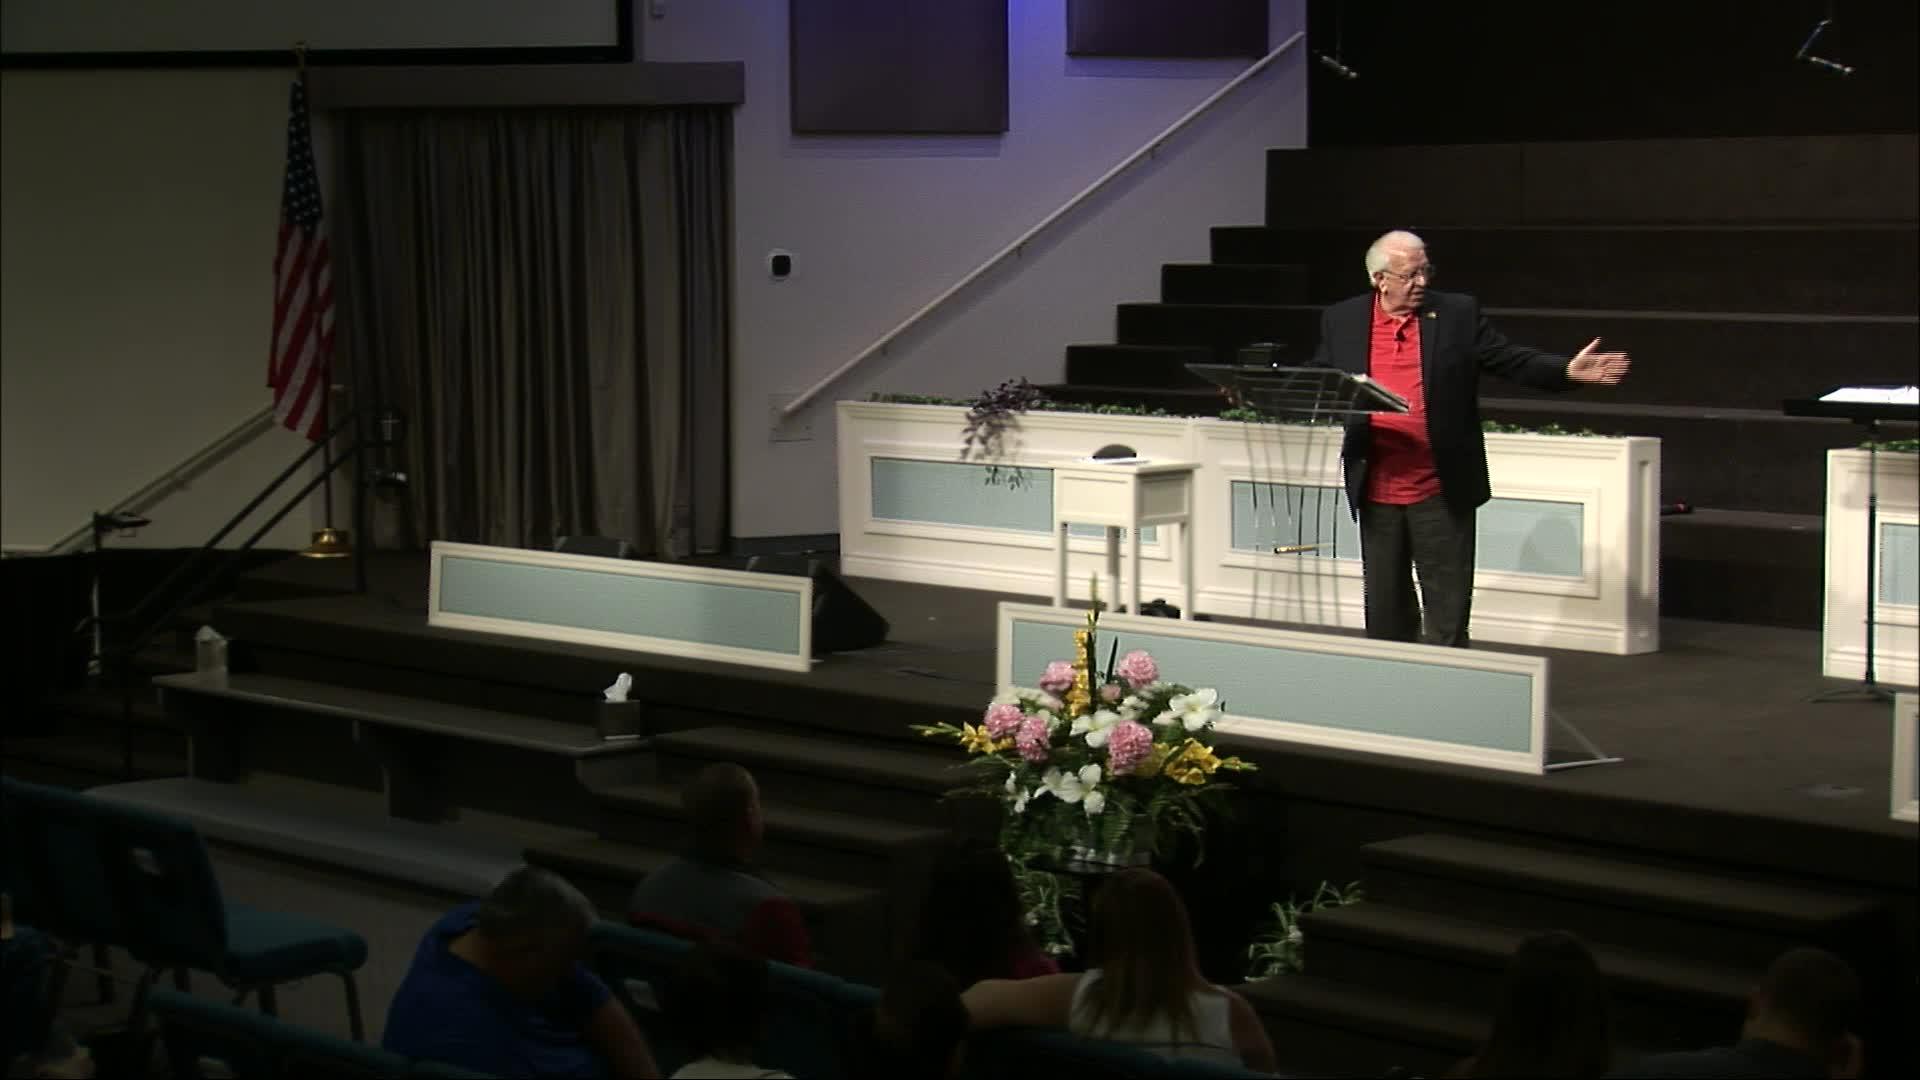 8:30-20 Sermon